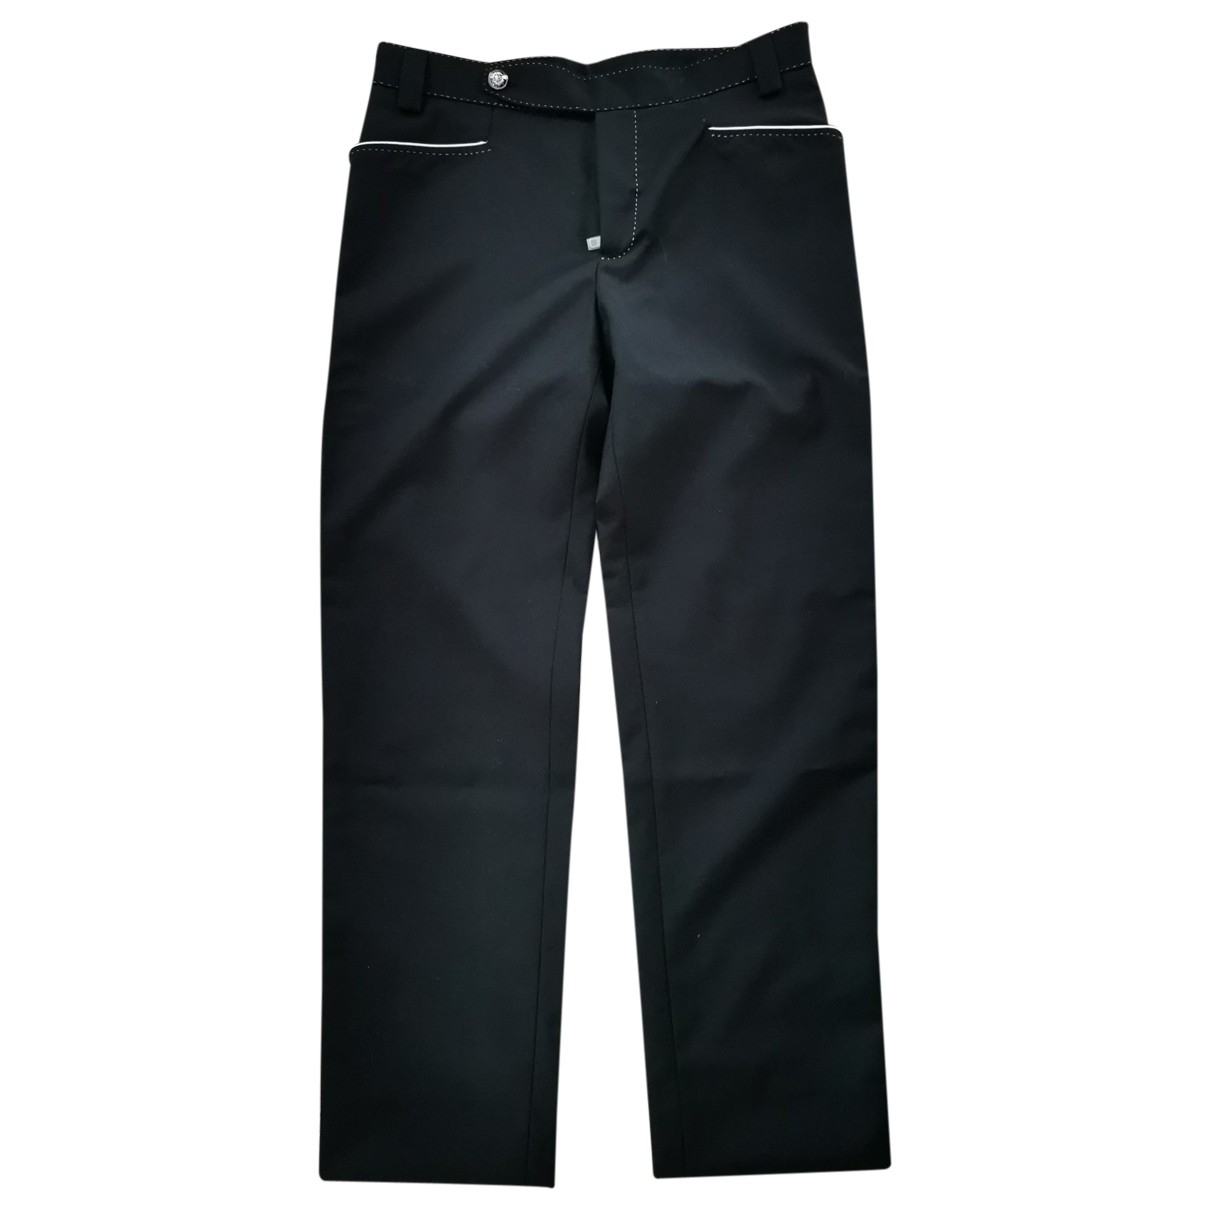 Pantalon de Lana Dolce & Gabbana